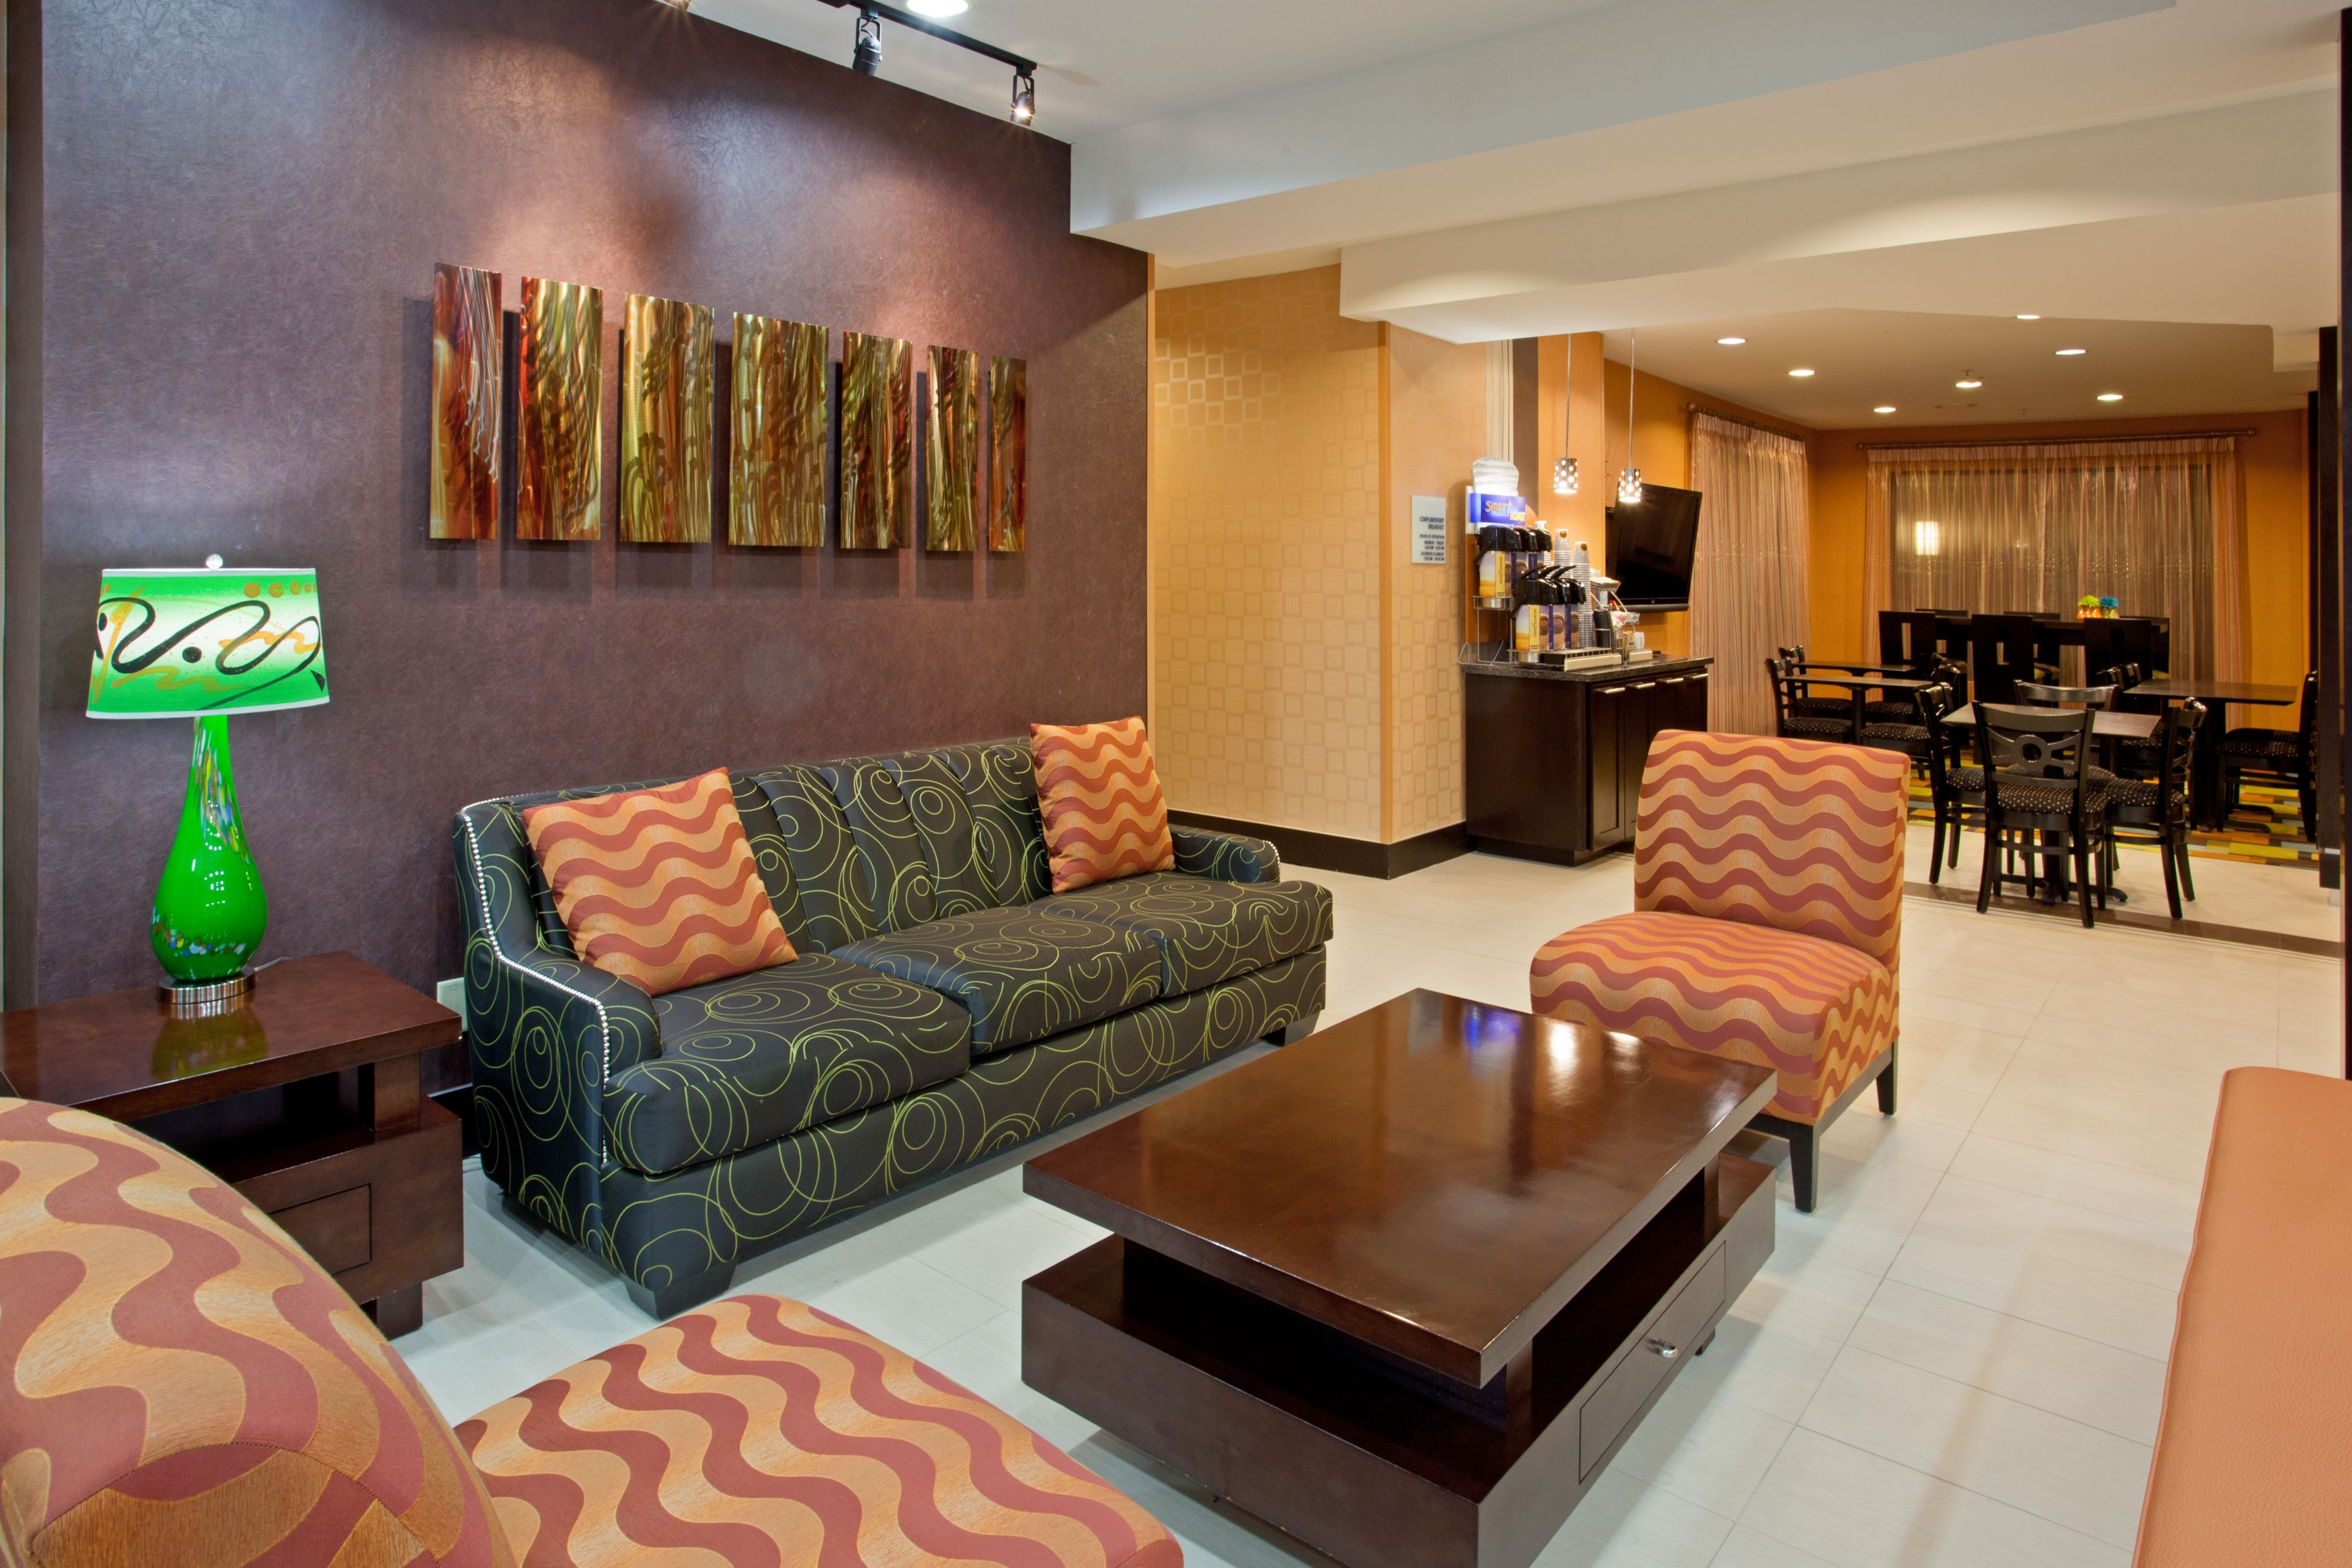 Holiday Inn Express & Suites Arlington (I-20-Parks Mall) image 5